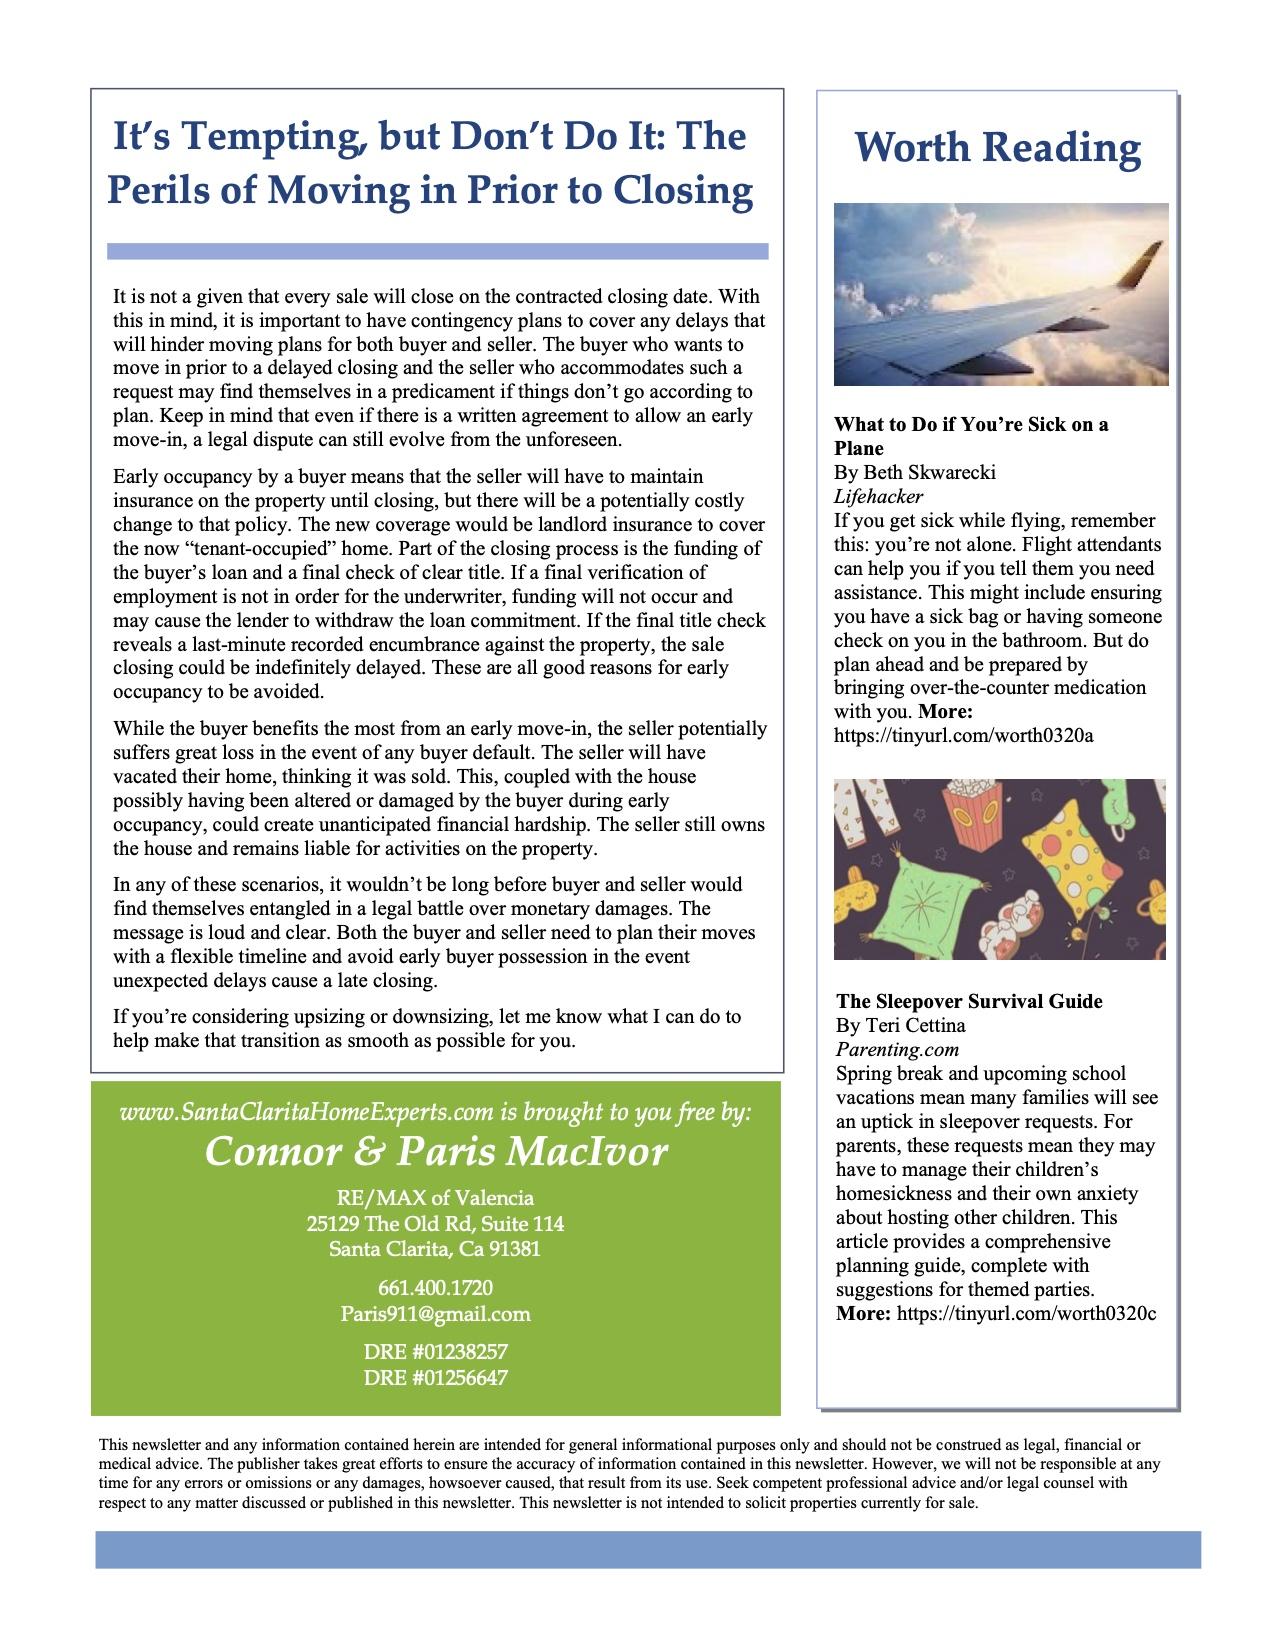 Santa Clarita News page 3